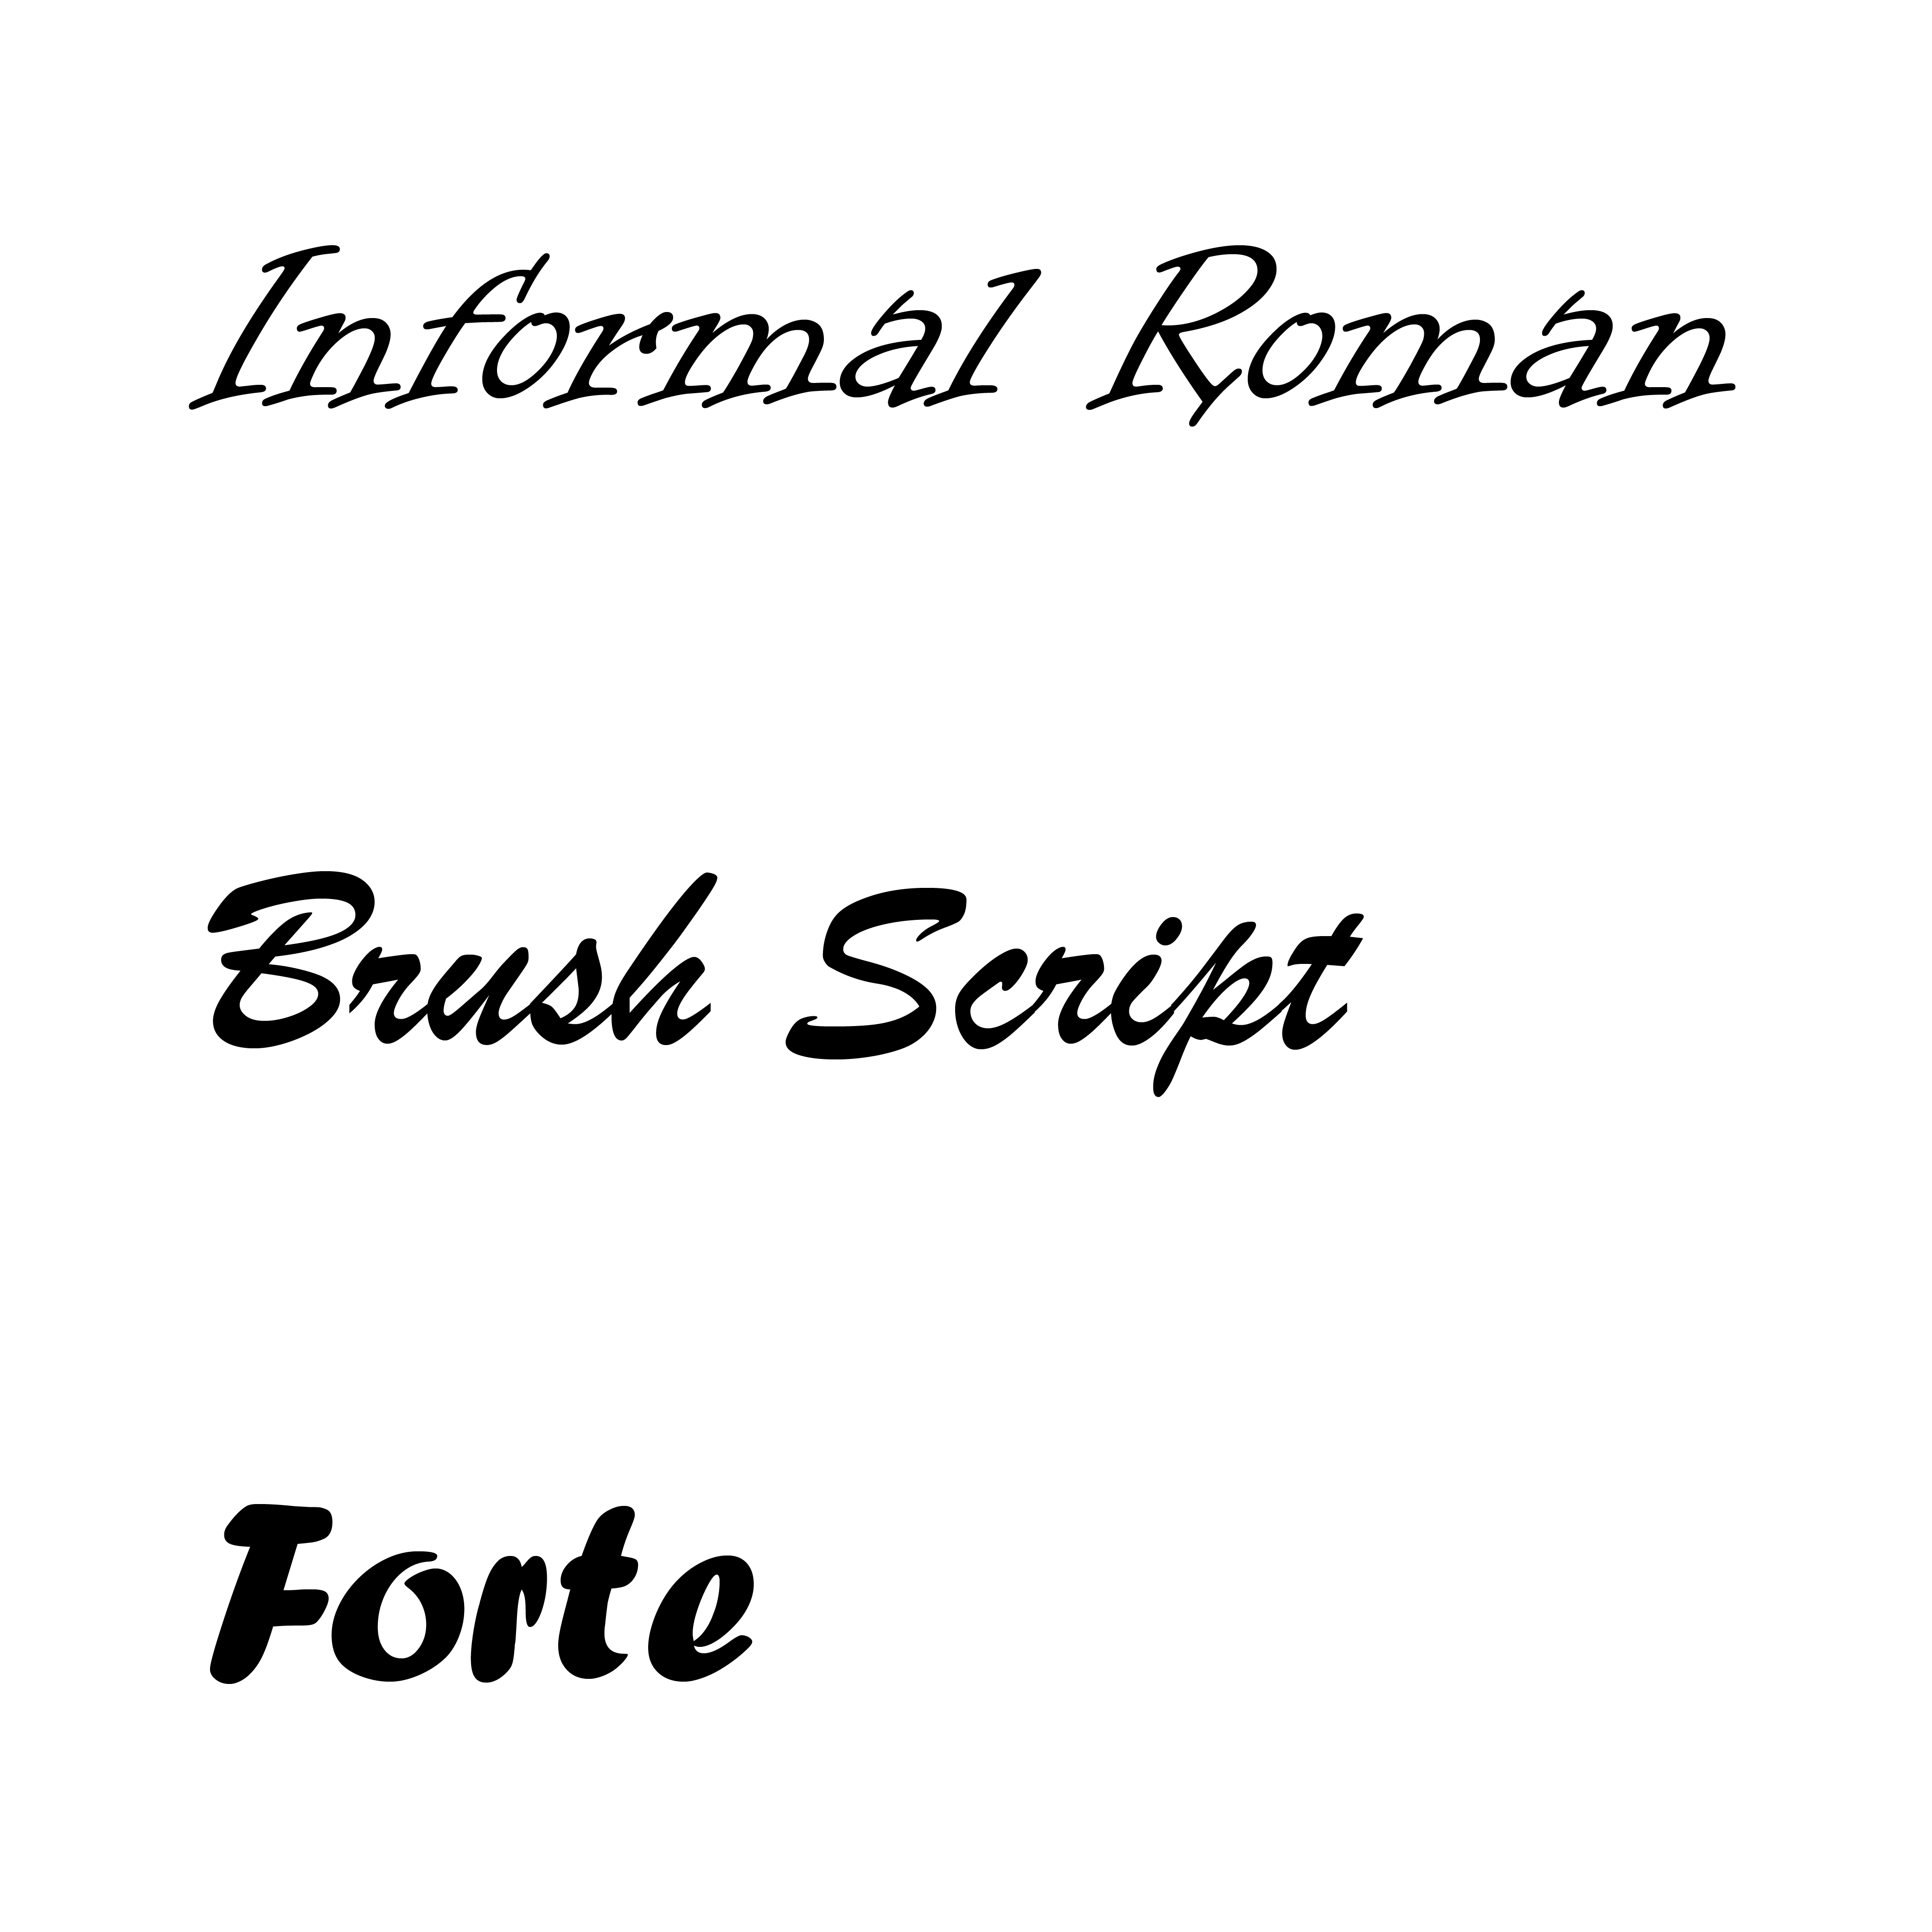 static/images/examples/Schrift_negativ_Beispiel.png